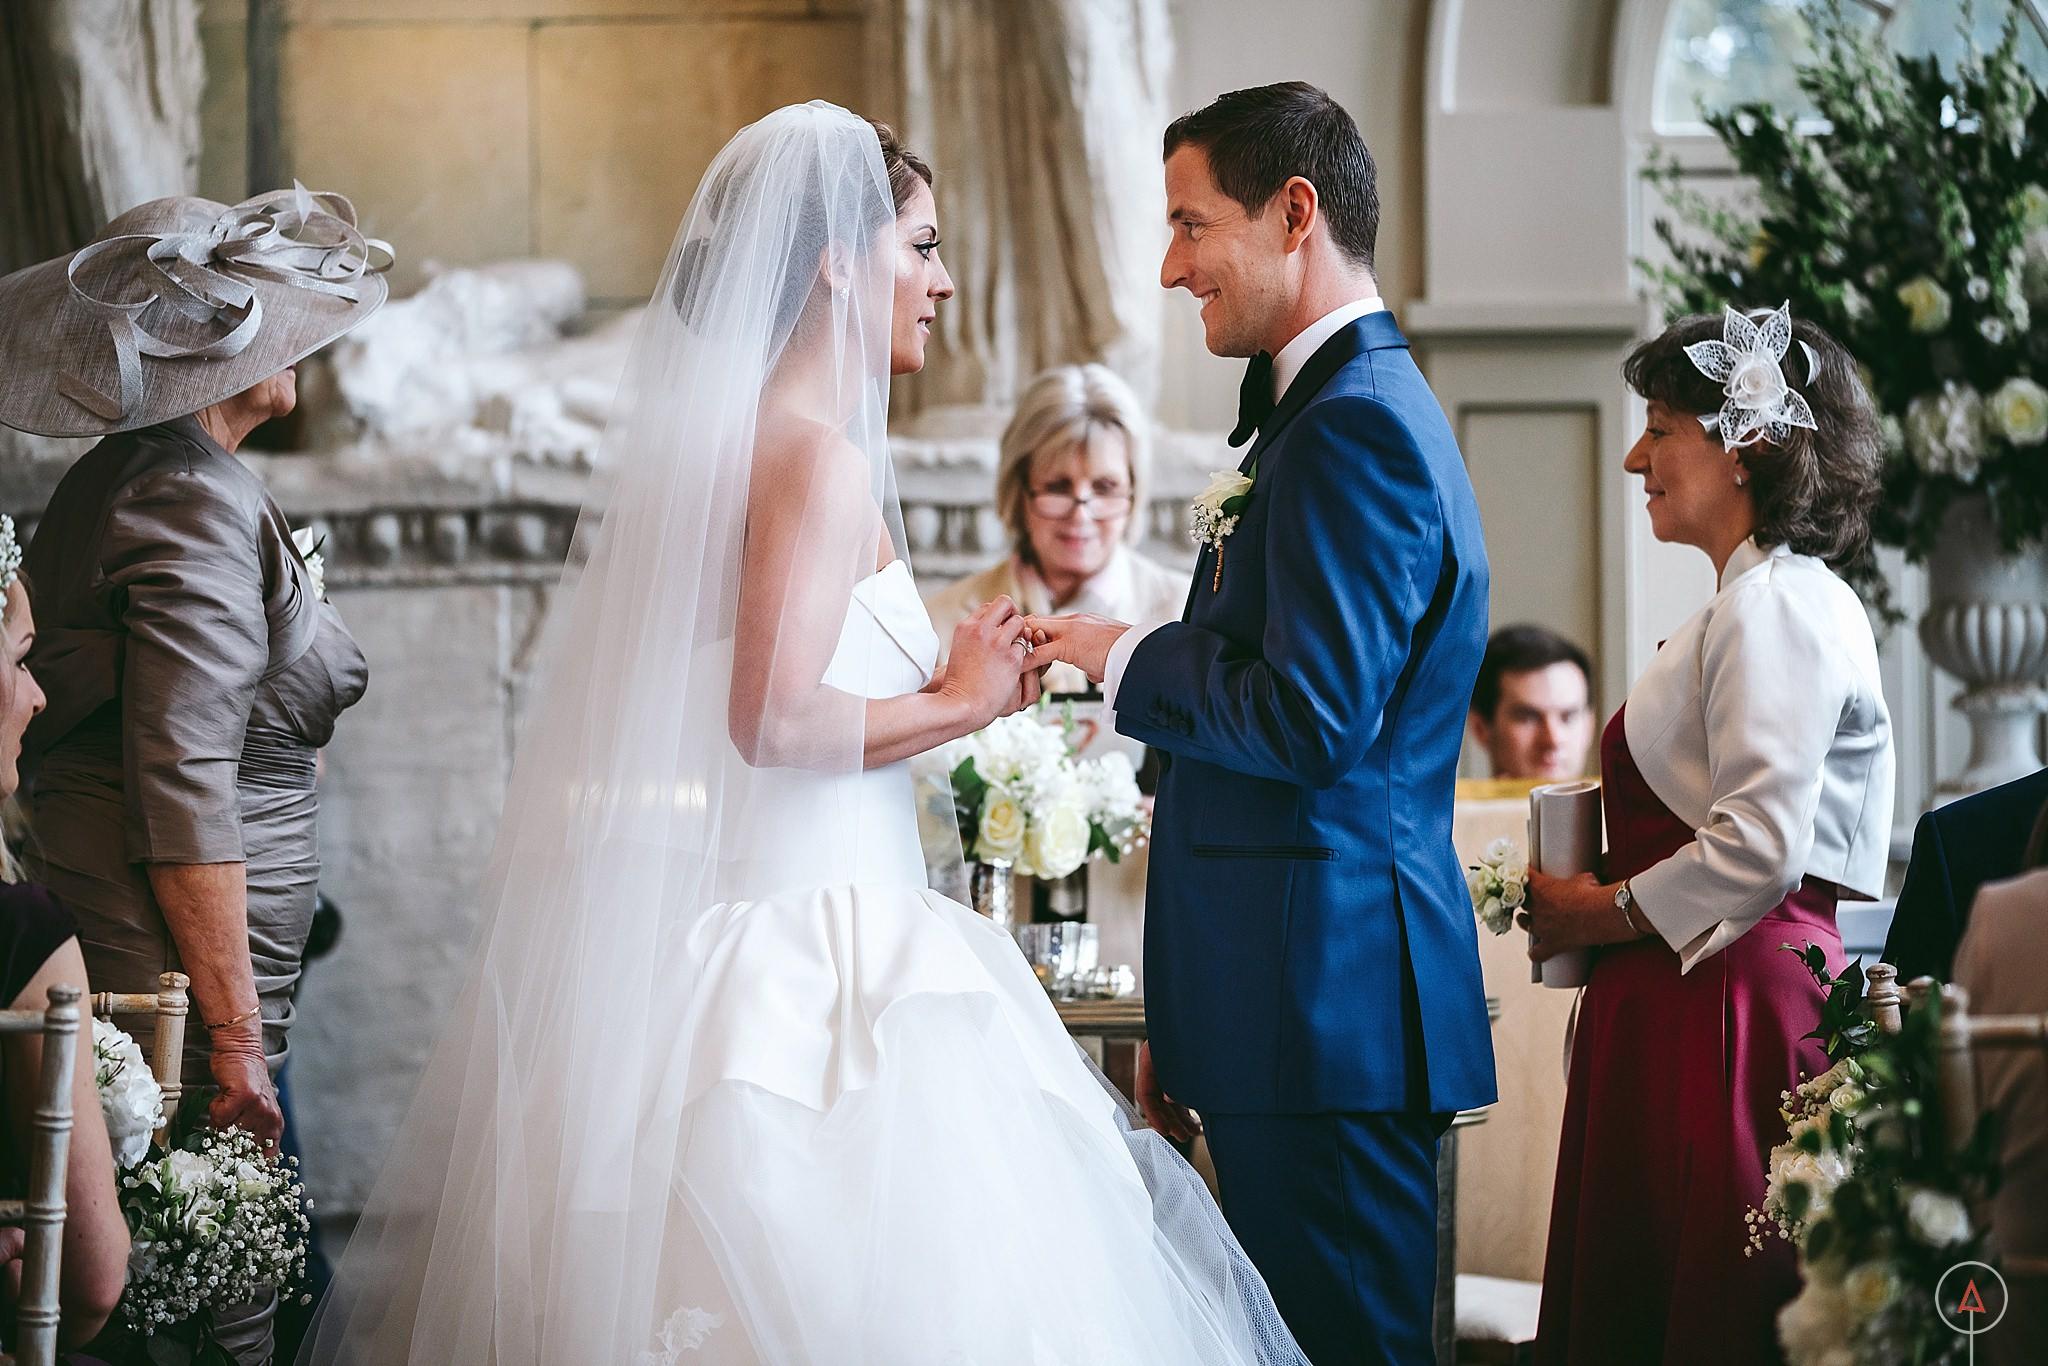 cardiff-wedding-photographer-aga-tomaszek_0254